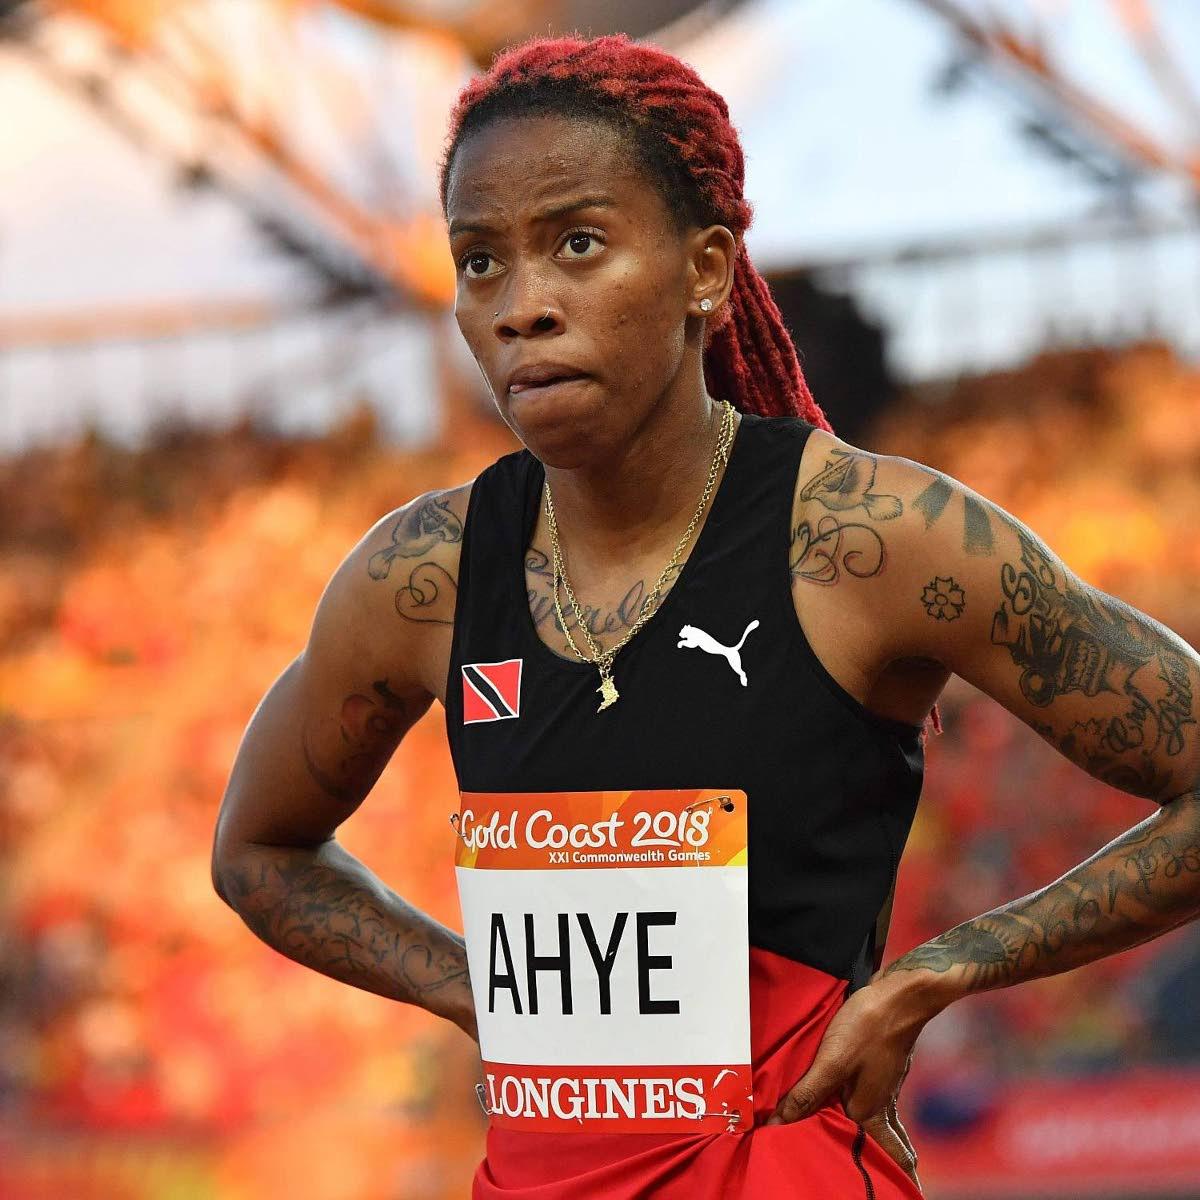 Michelle-Lee Ahye